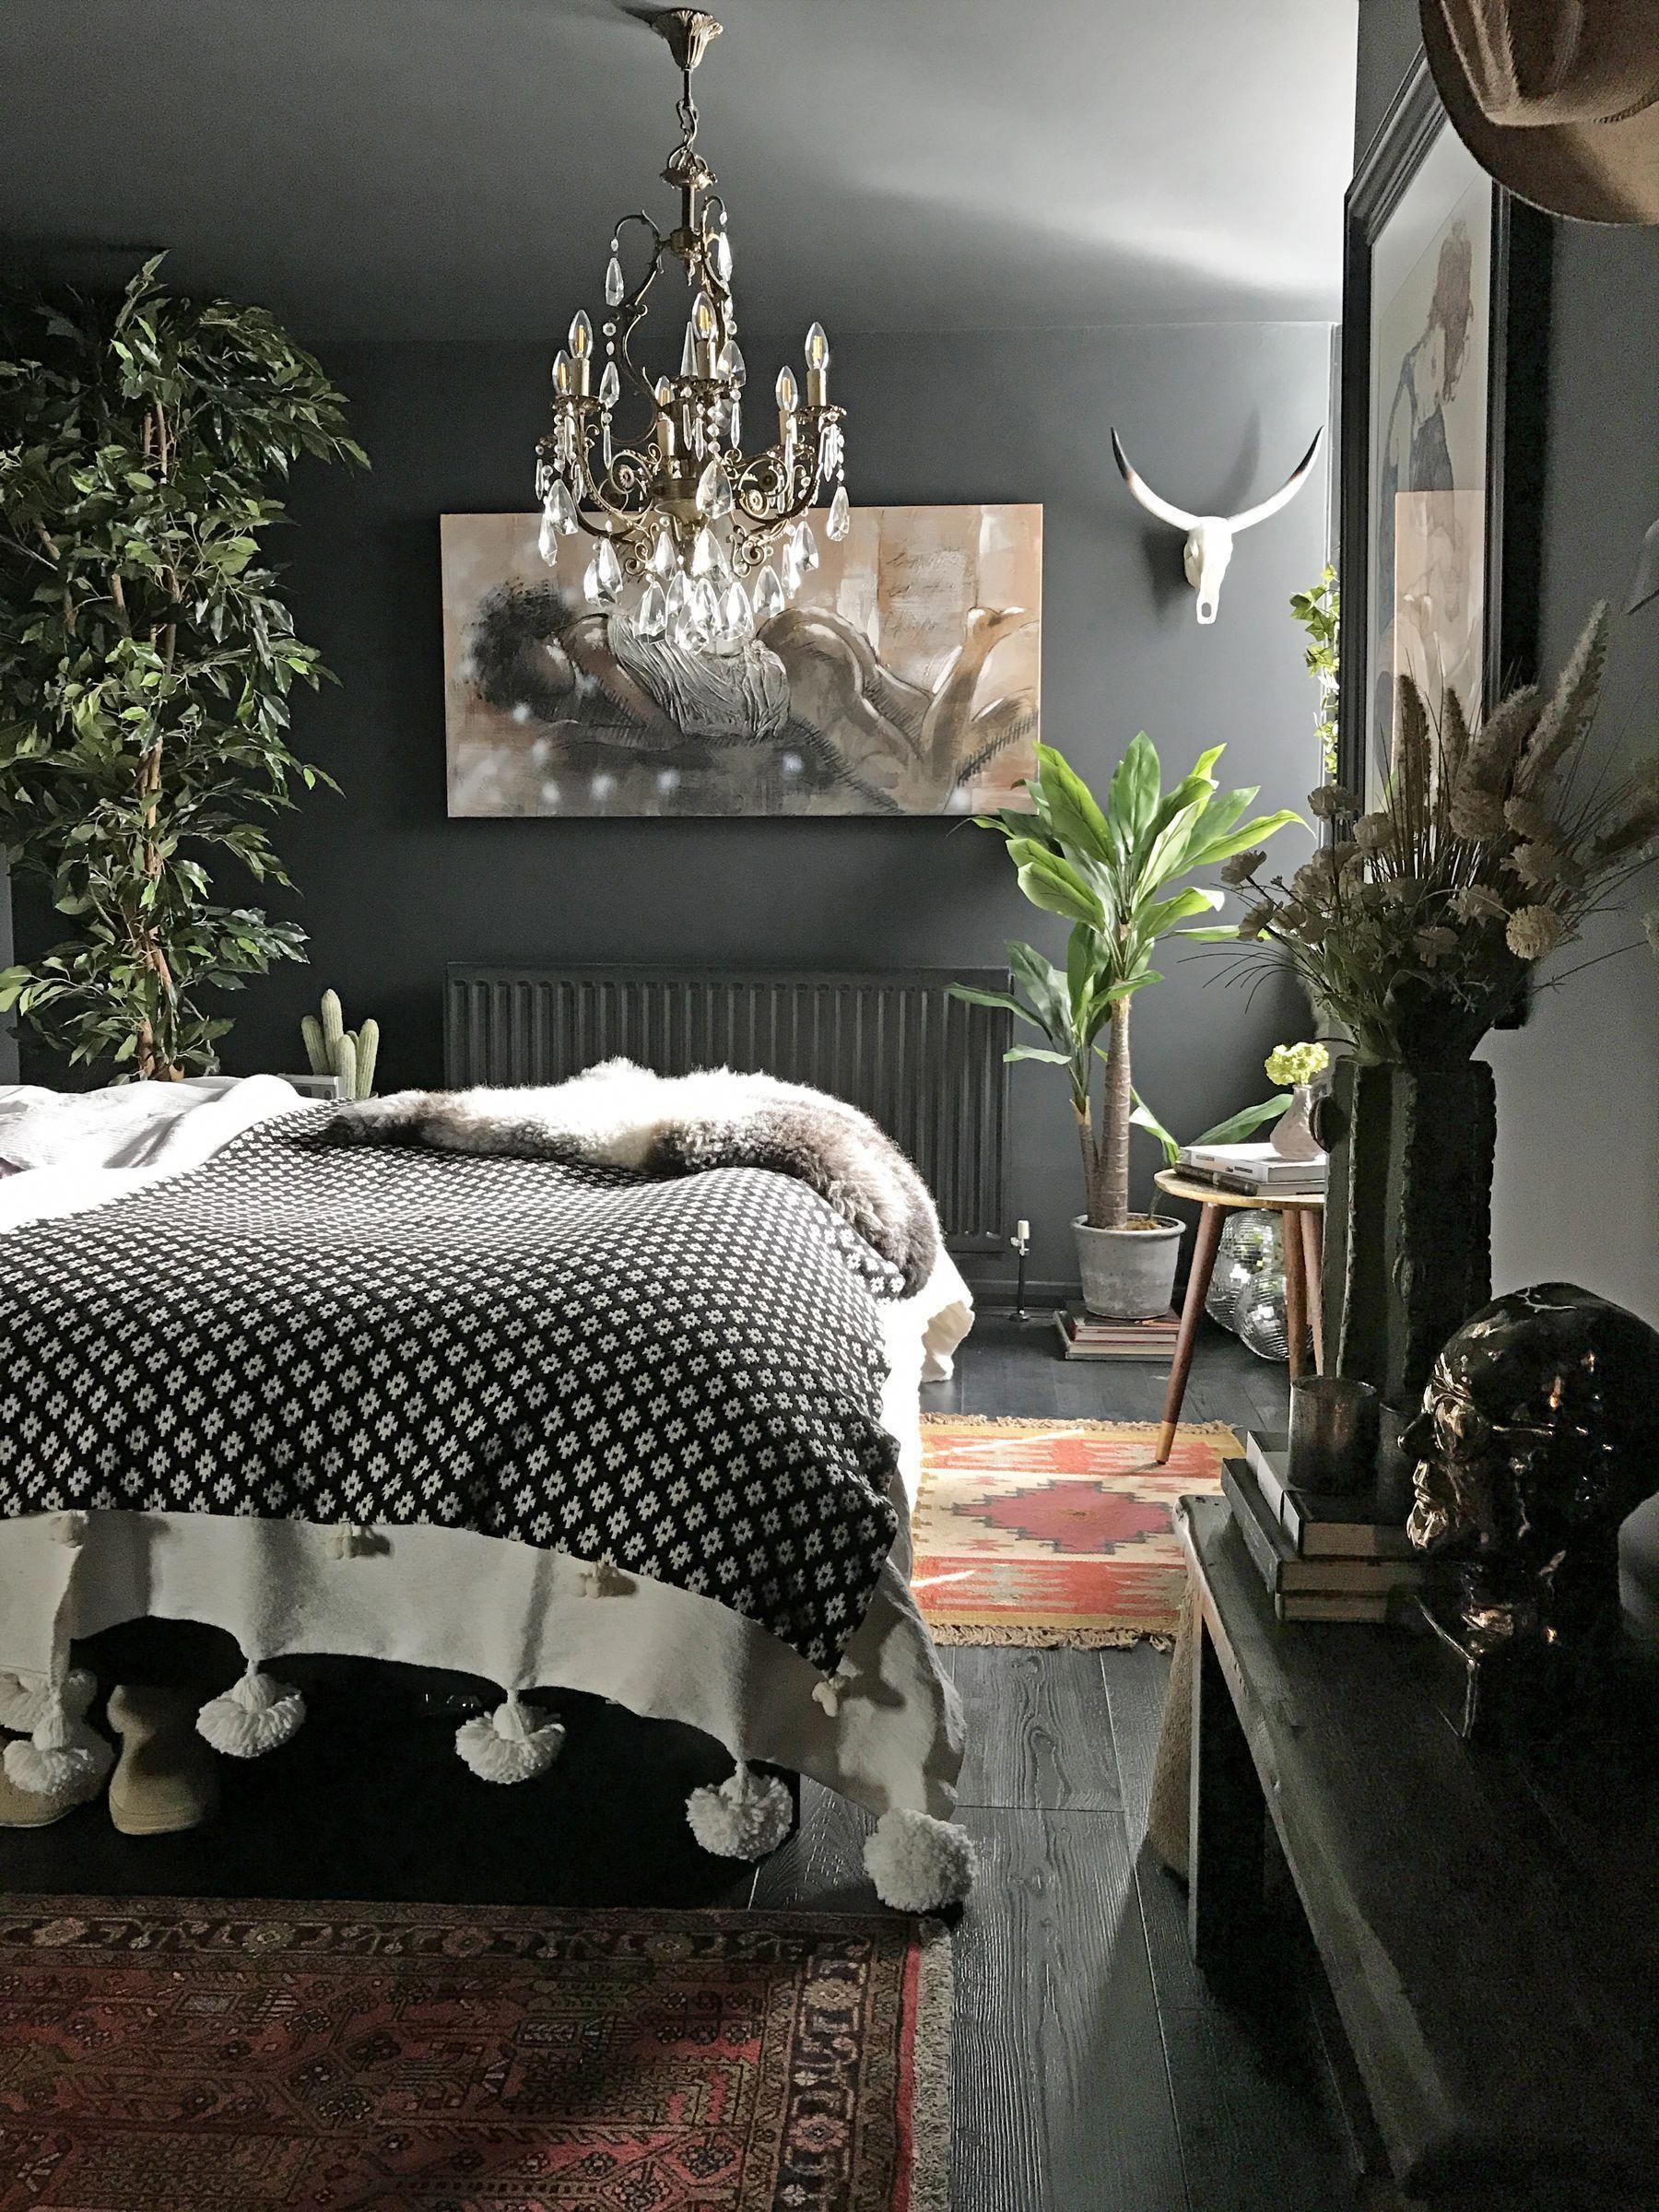 Home decorators lighting collection also decor ideas pinterest rh